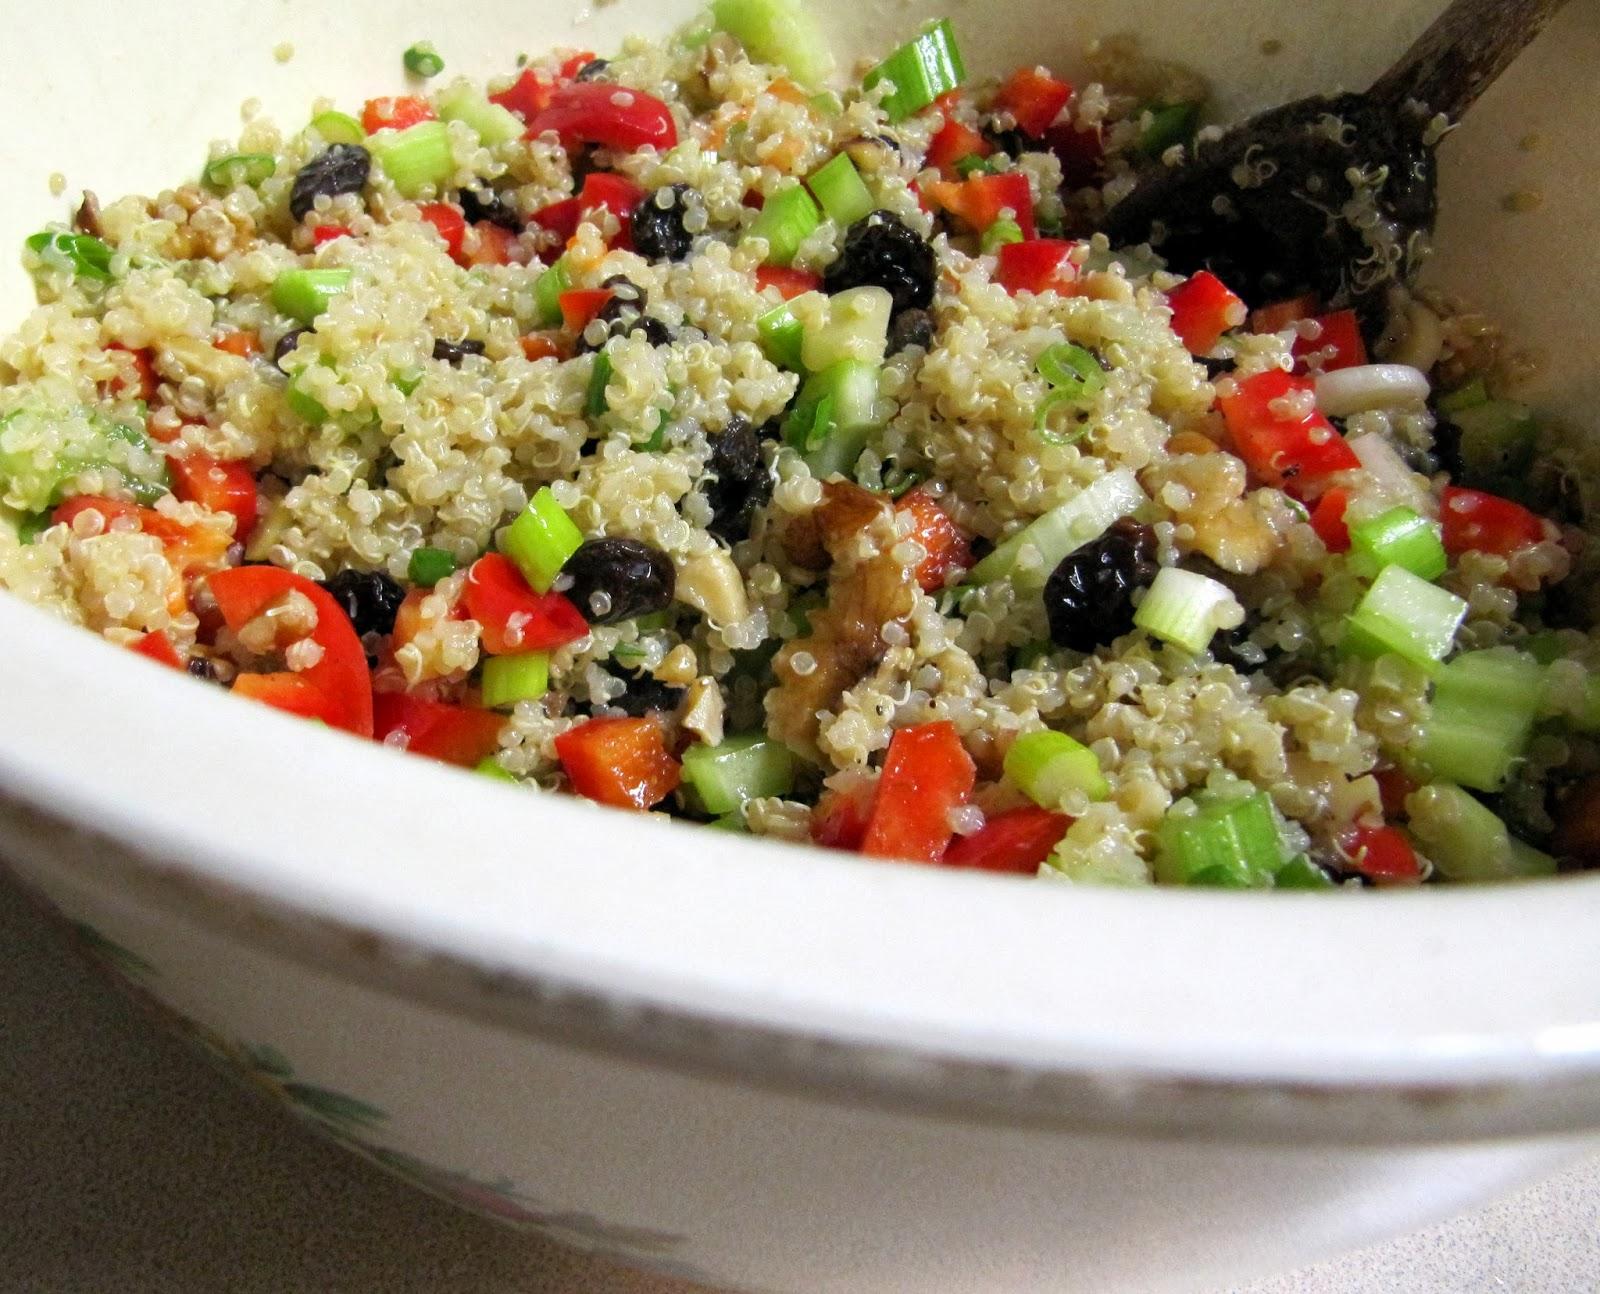 Grad Gastronomy: Easy Quinoa Salad